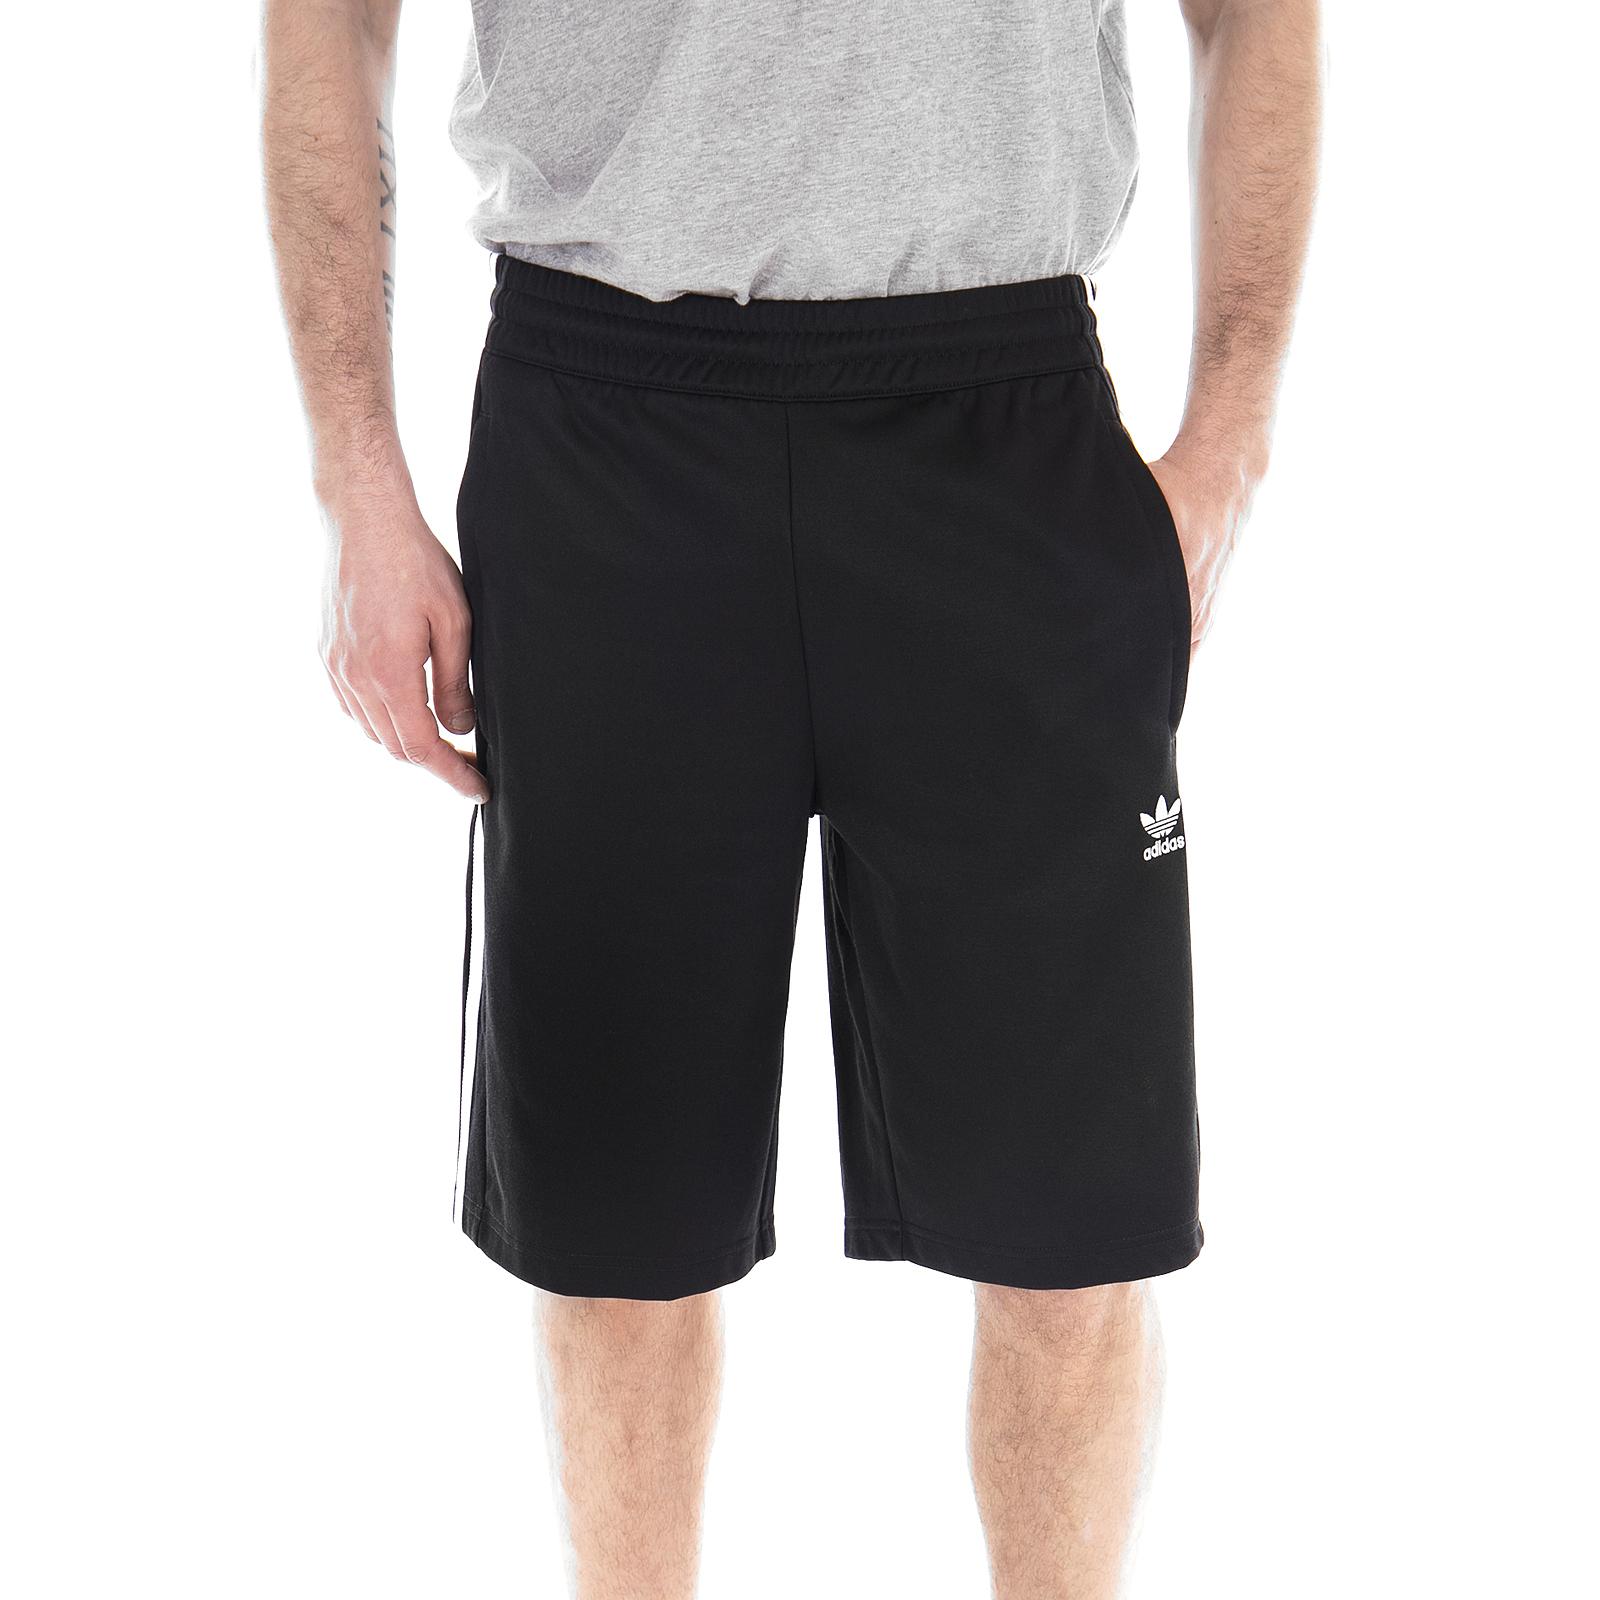 Adidas Shorts Snap Shorts Shorts Shorts nero Nero de73de